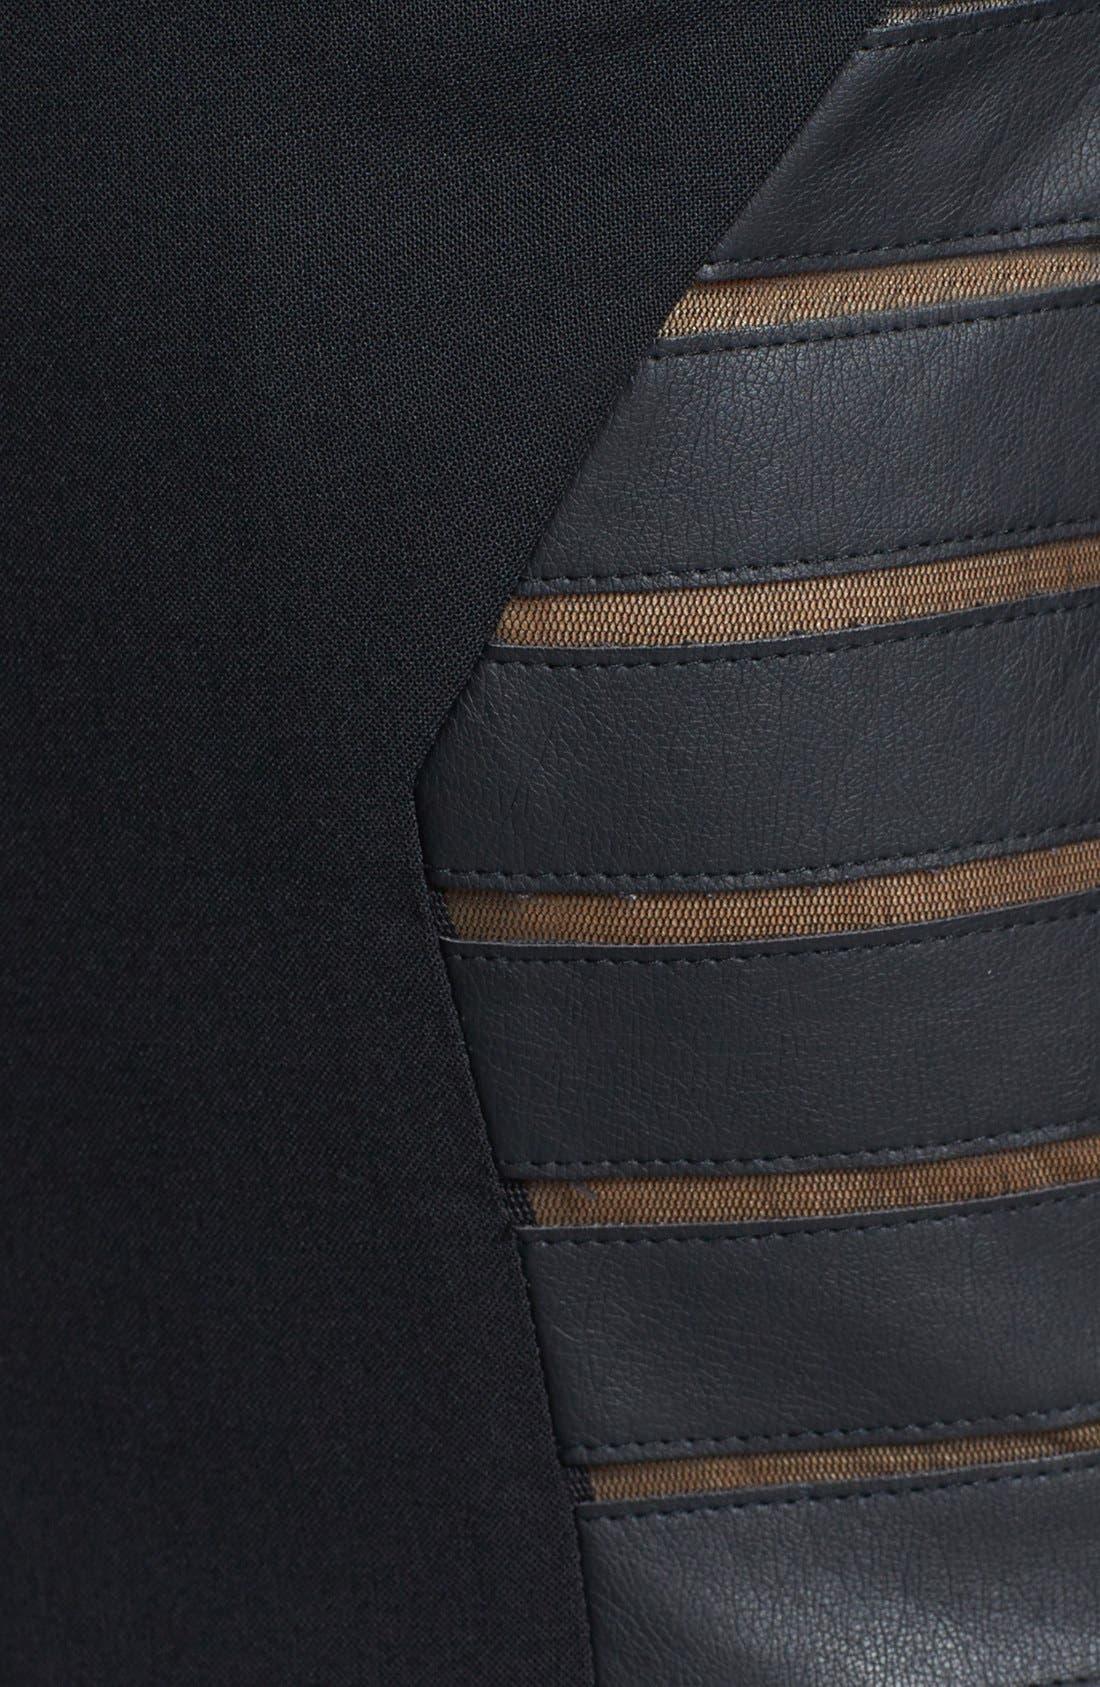 Alternate Image 3  - Rachel Roy Faux Leather Trim V-Neck Dress